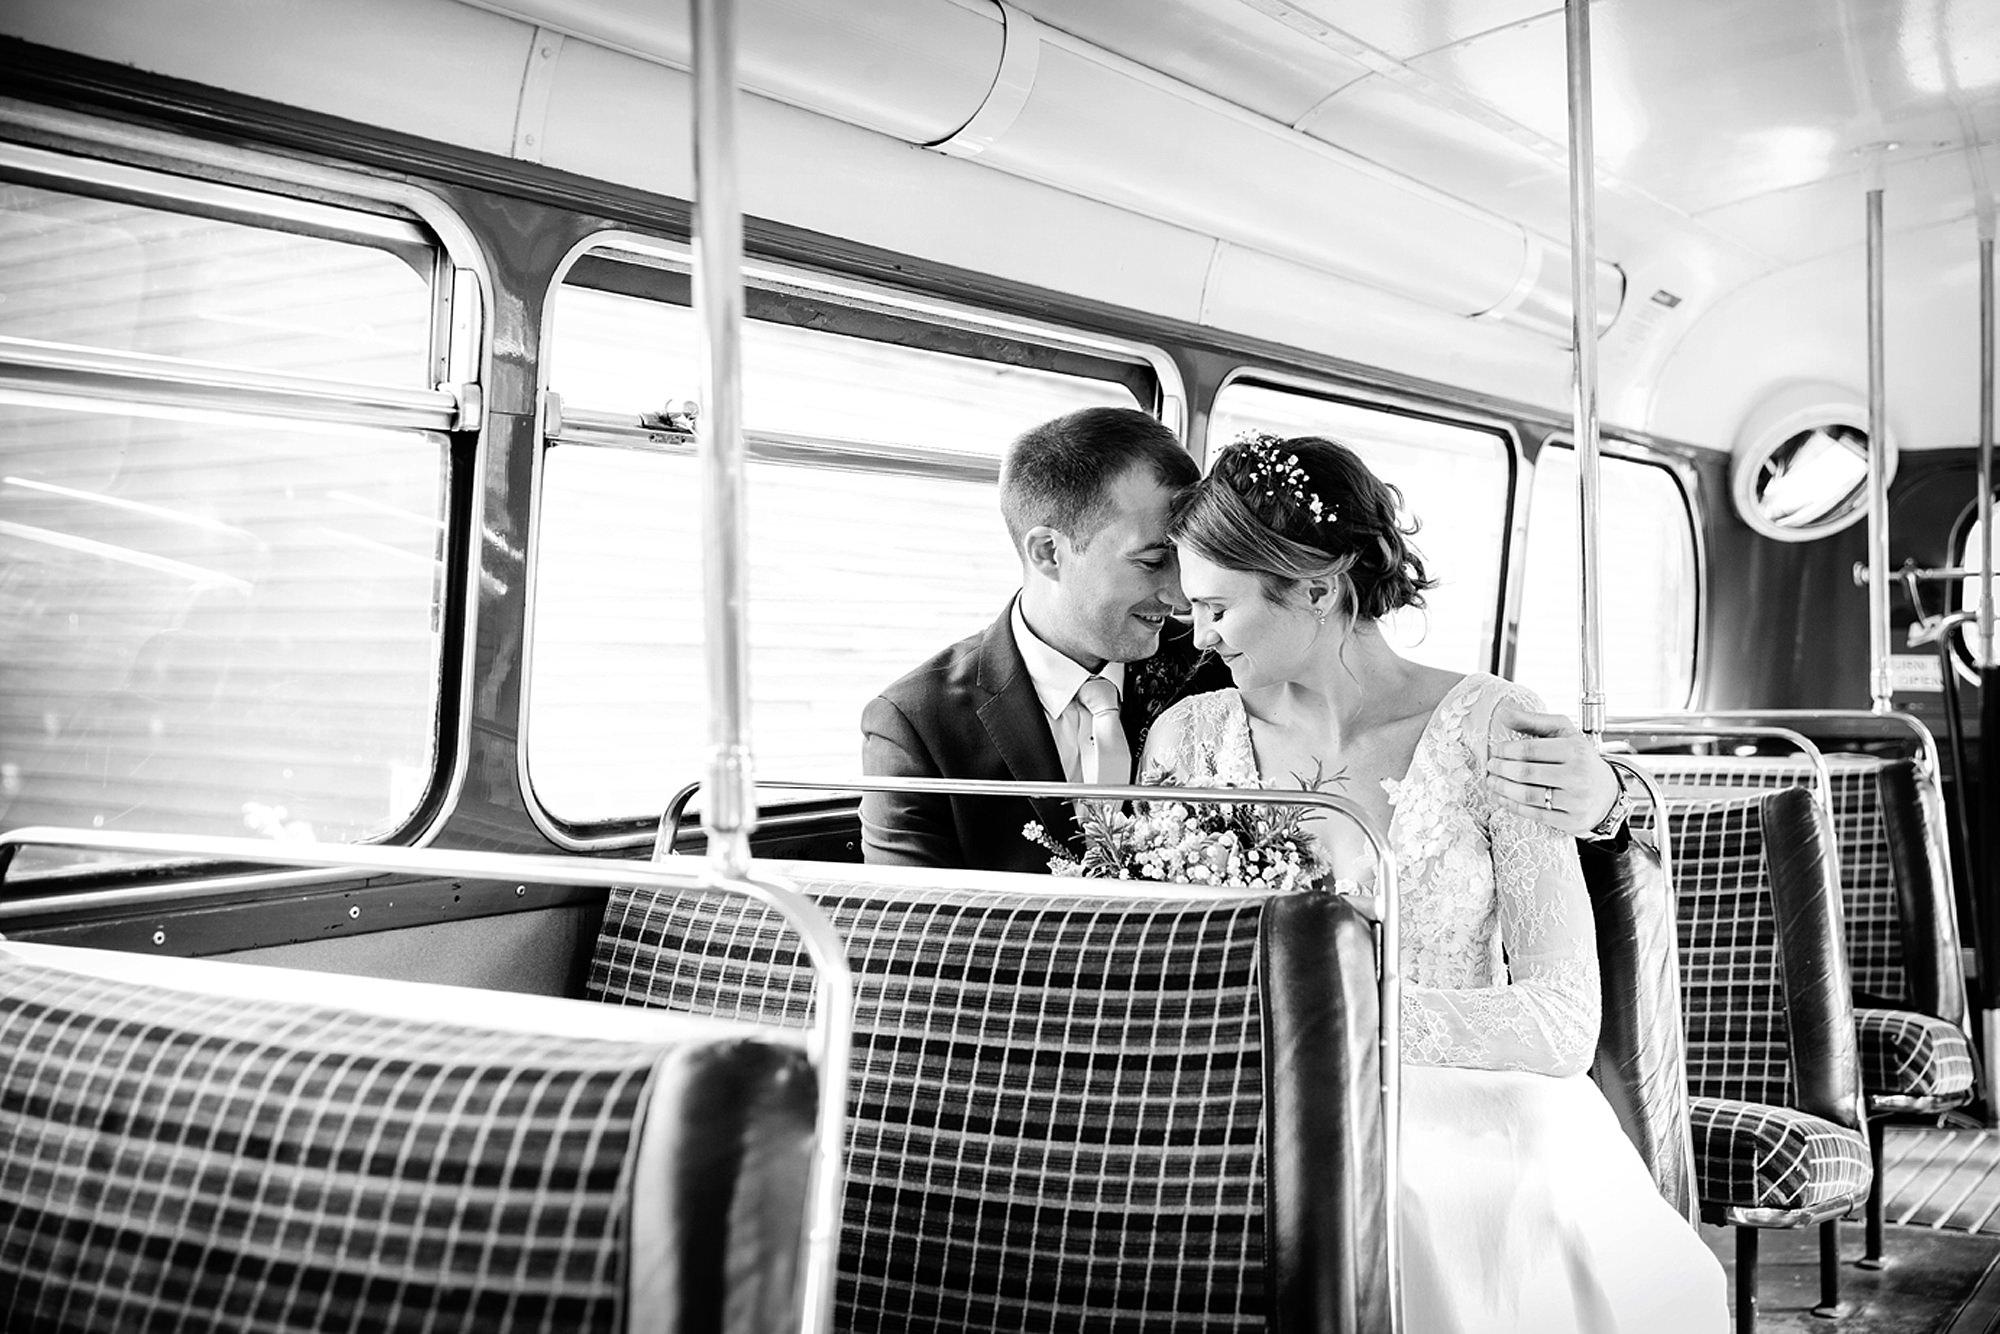 Marks Hall Estate wedding photography bride and groom together on vintage london bus